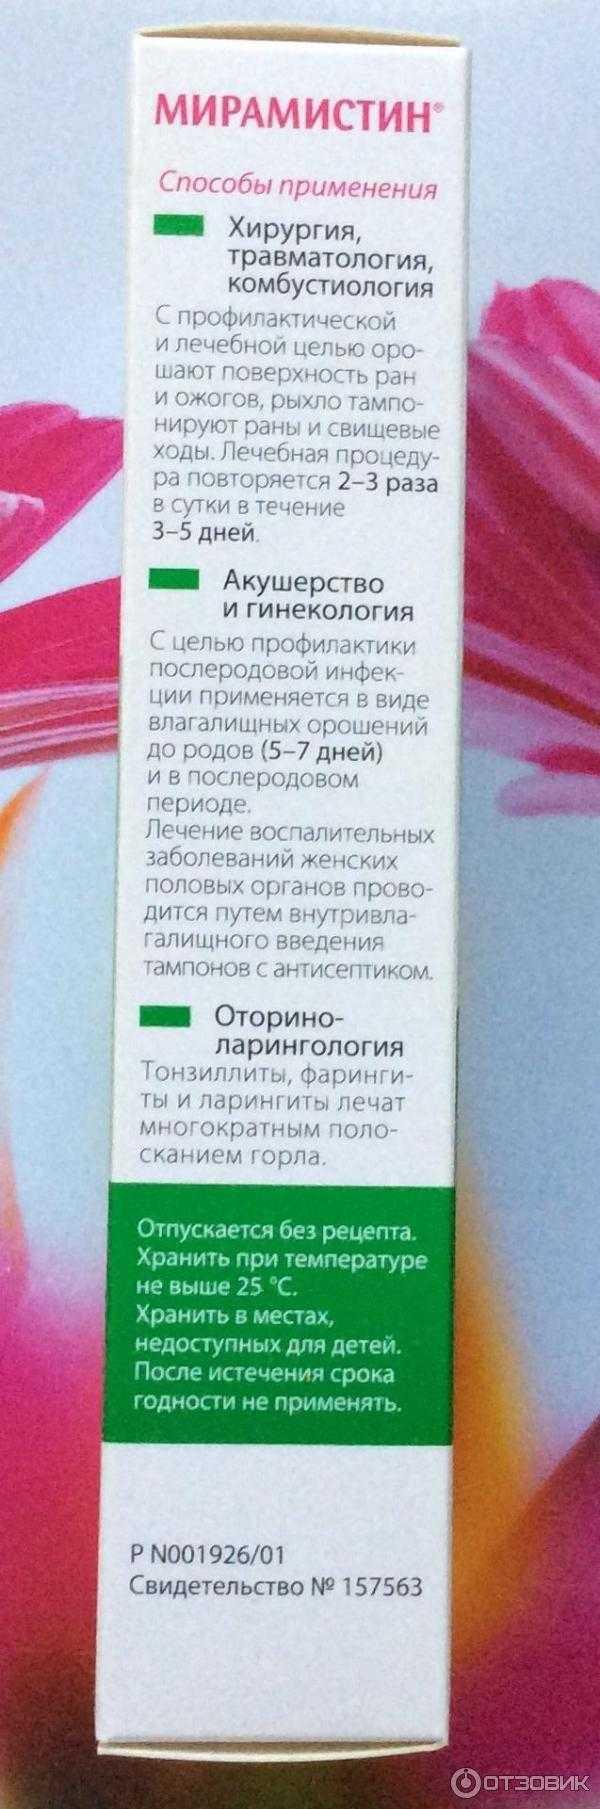 Мирамистин при беременности